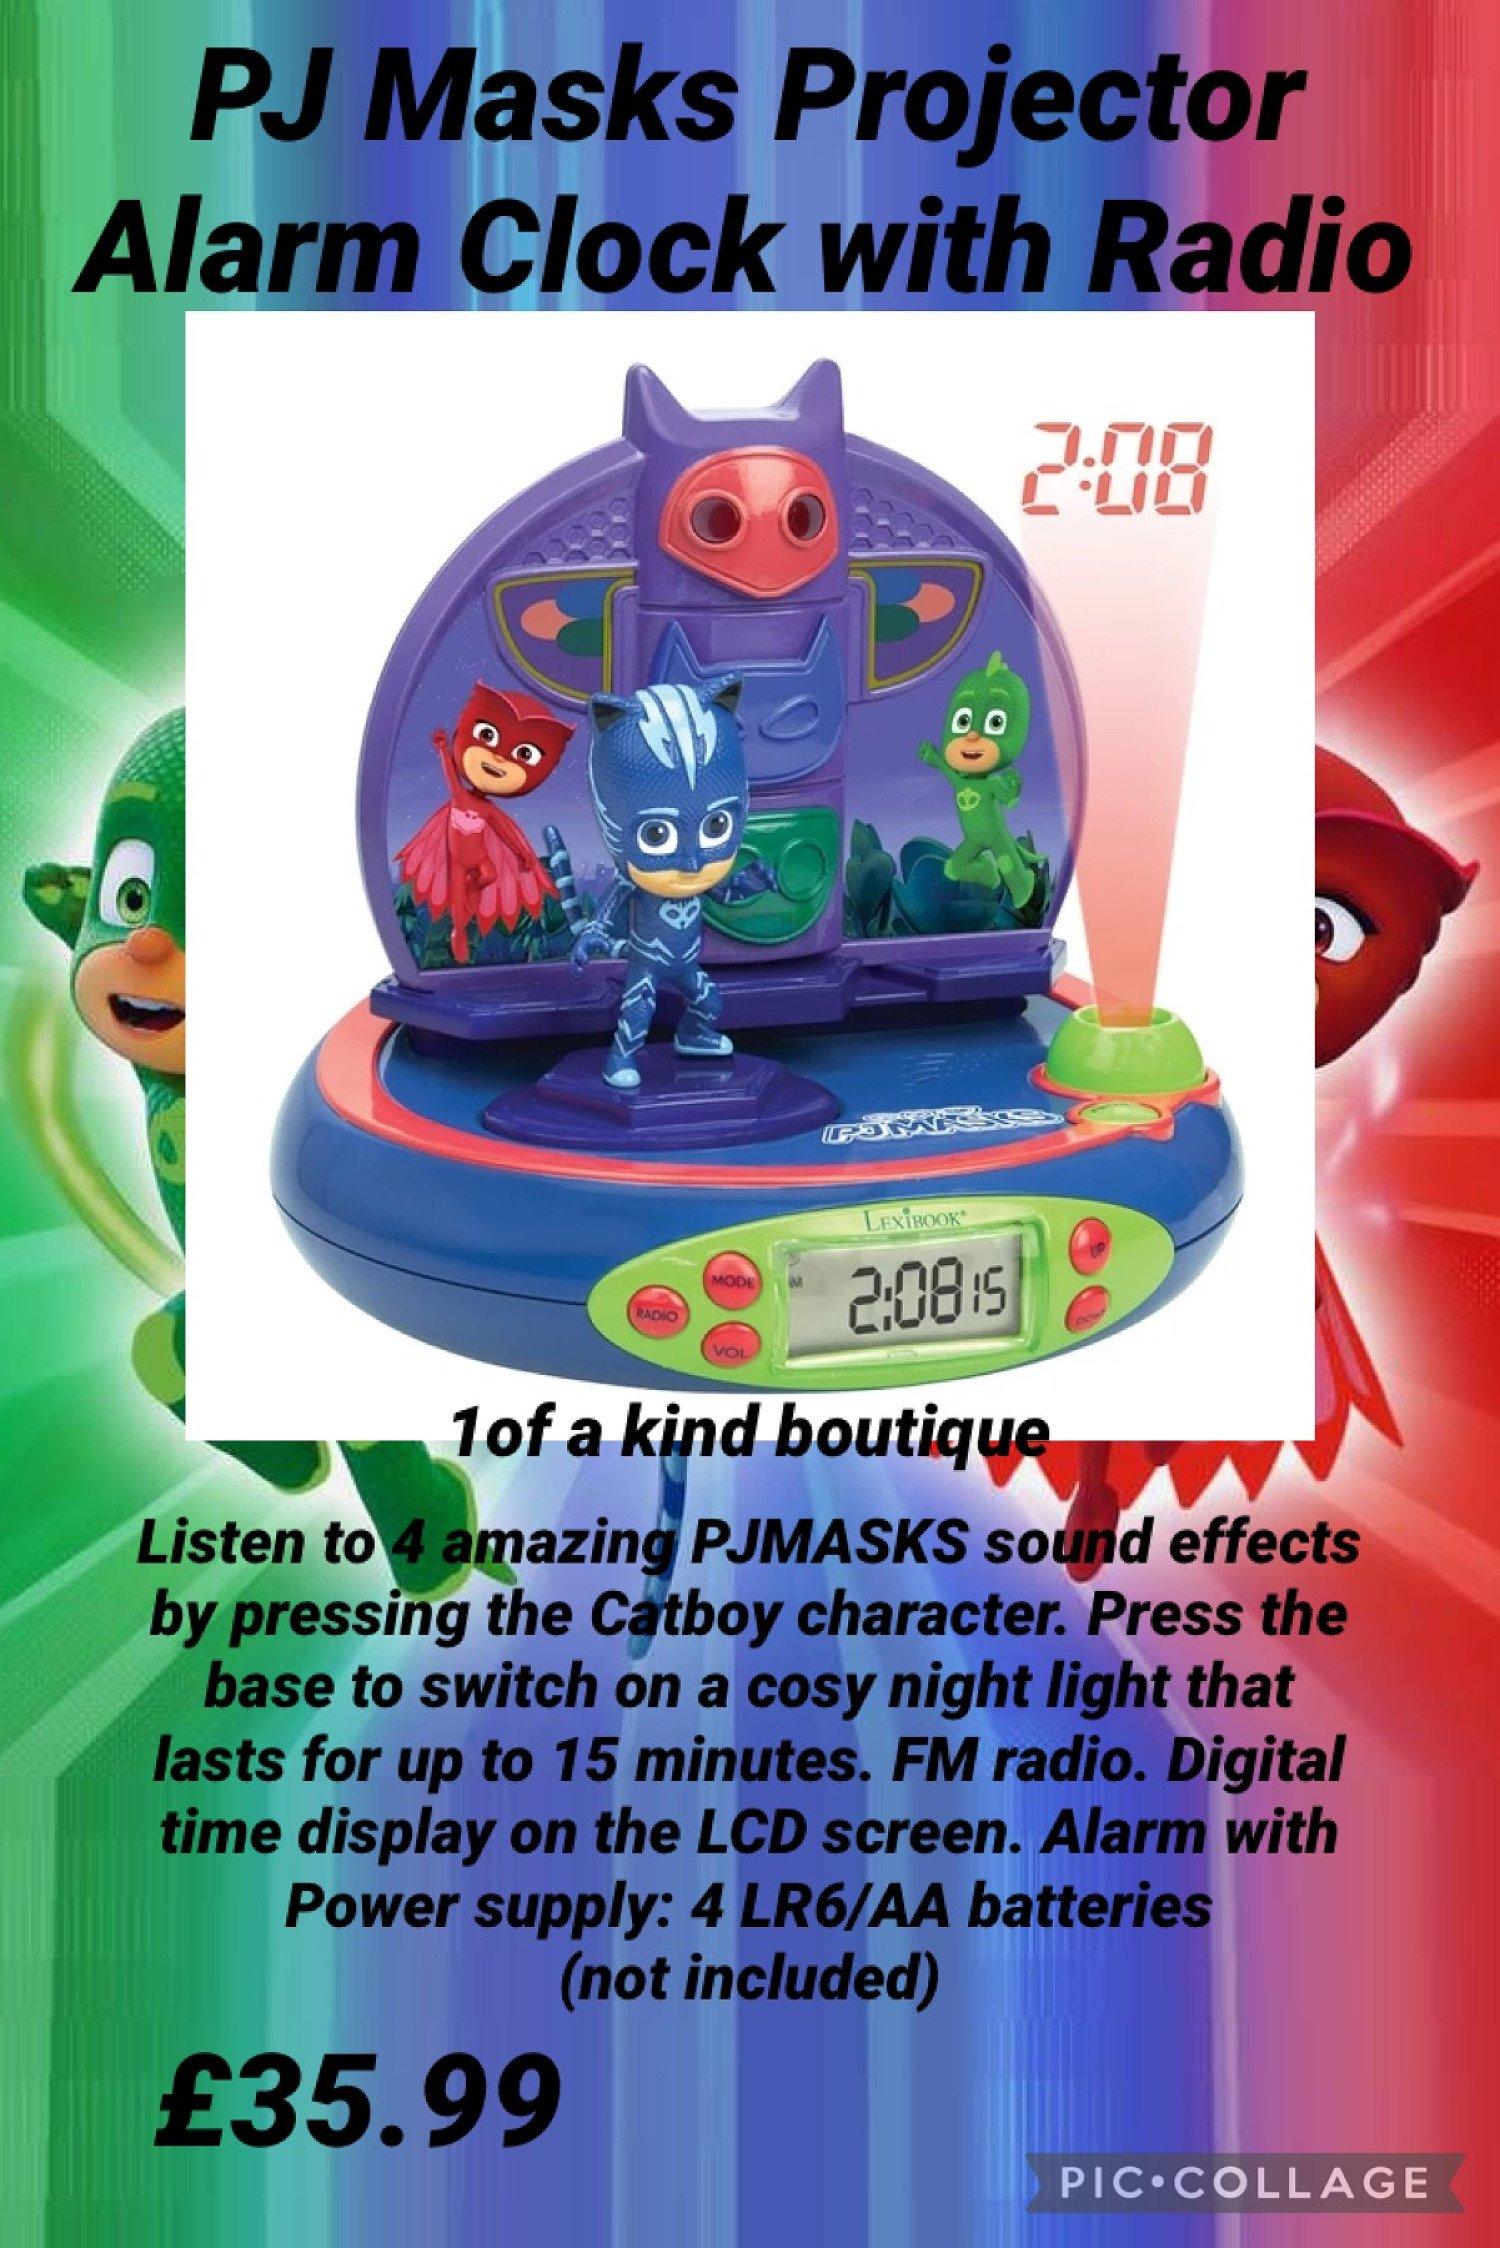 PJ Masks Projector Alarm Clock with Radio Free Postage